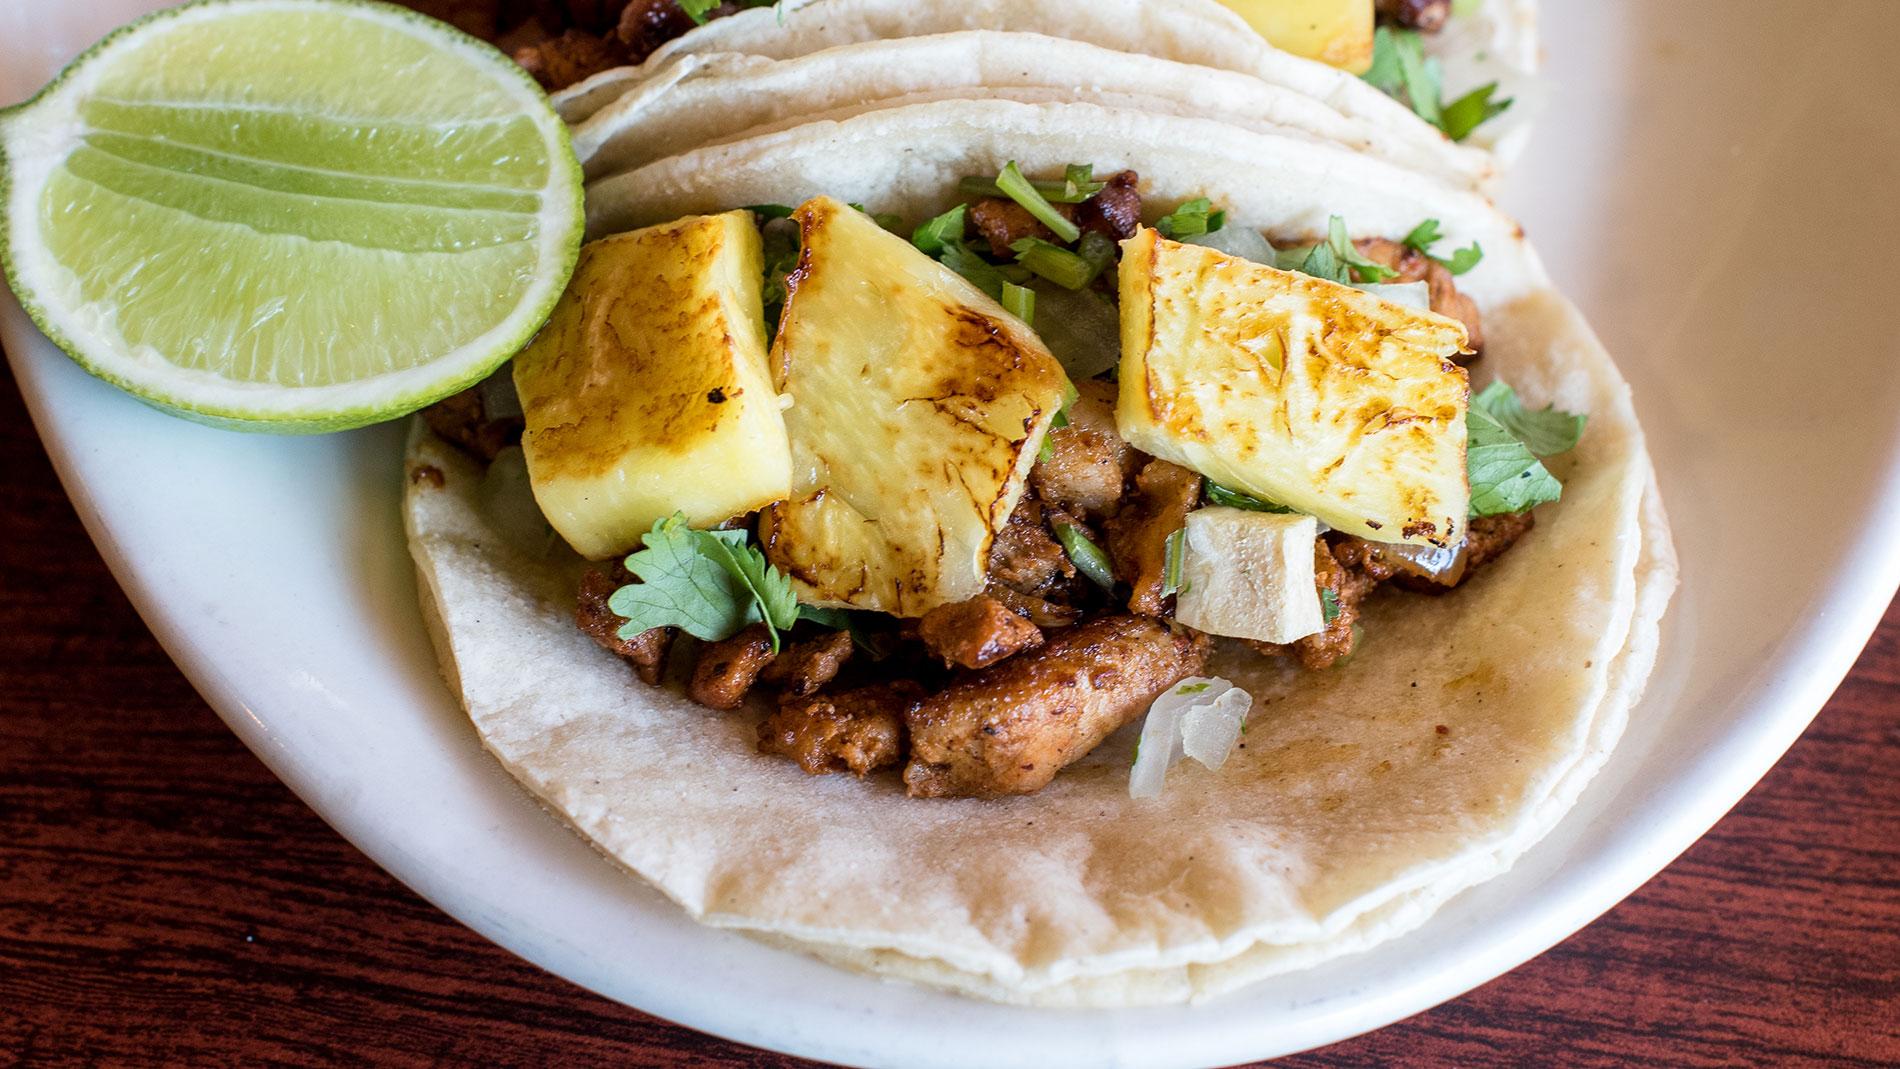 al pastor tacos from la vallesana on cherokee street in st. louis